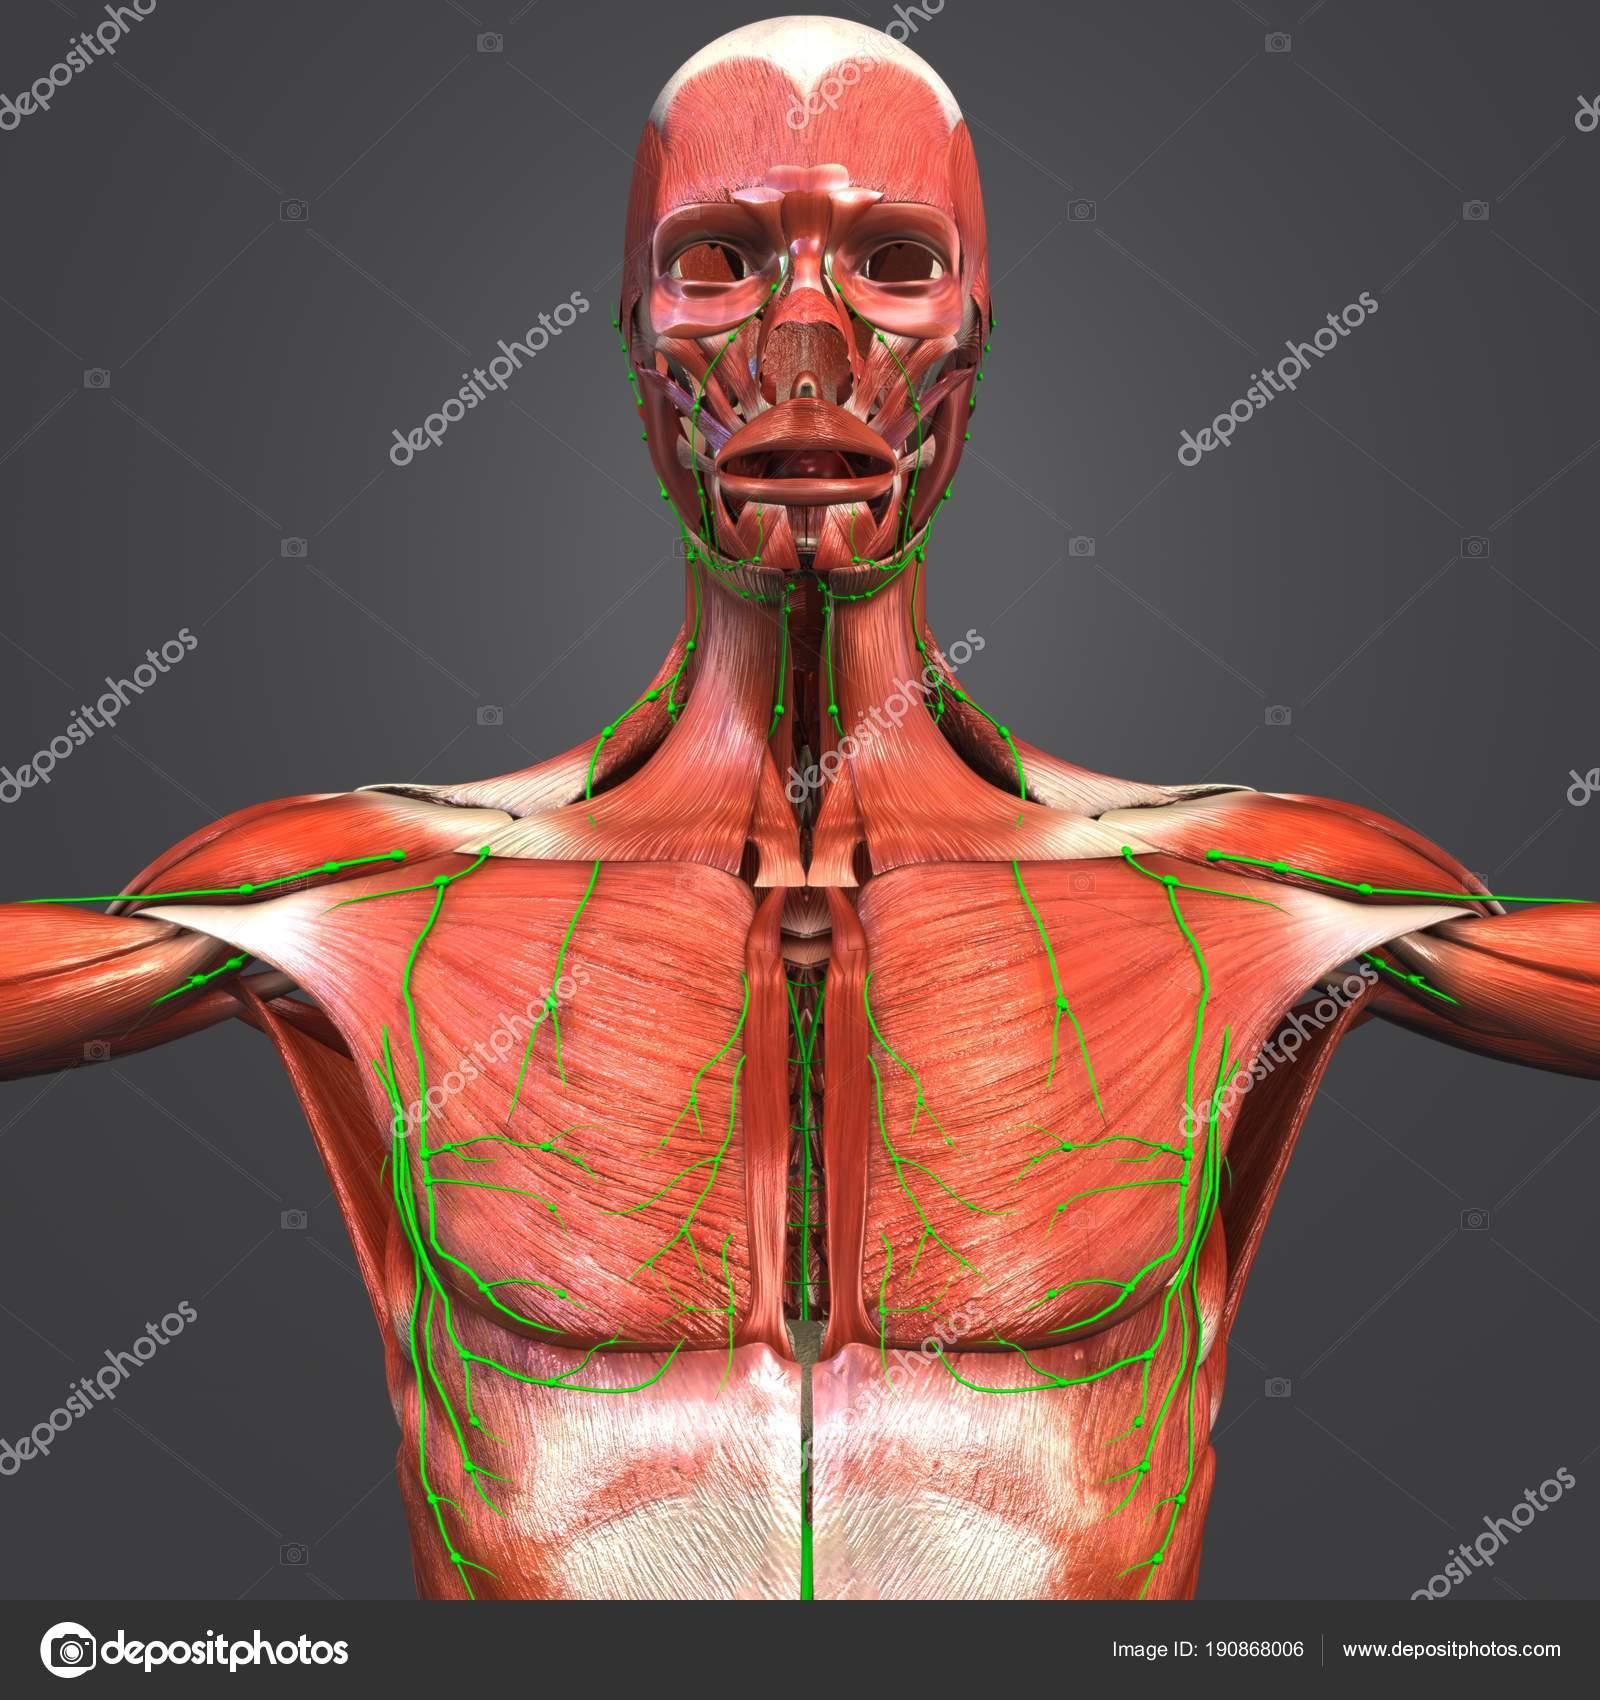 Colorida Ilustración Médica Anatomía Muscular Humana Con Ganglios ...